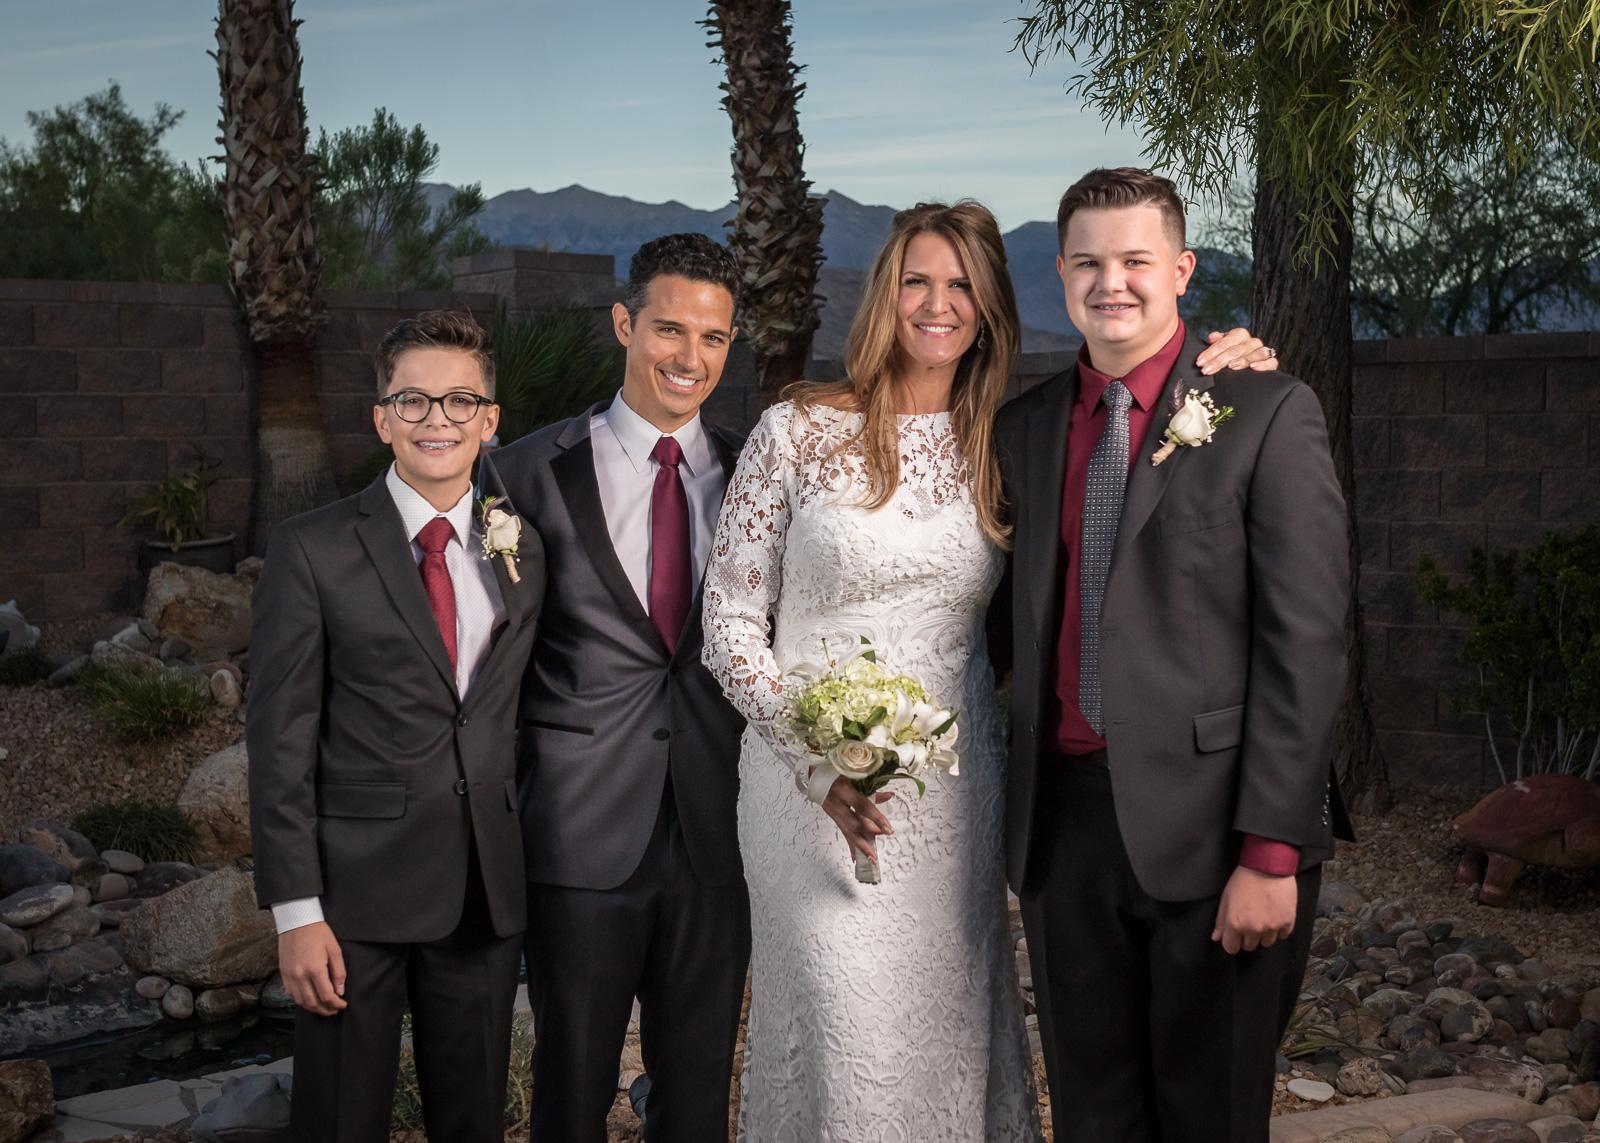 Cabrera-Wedding-Reception-9.jpg